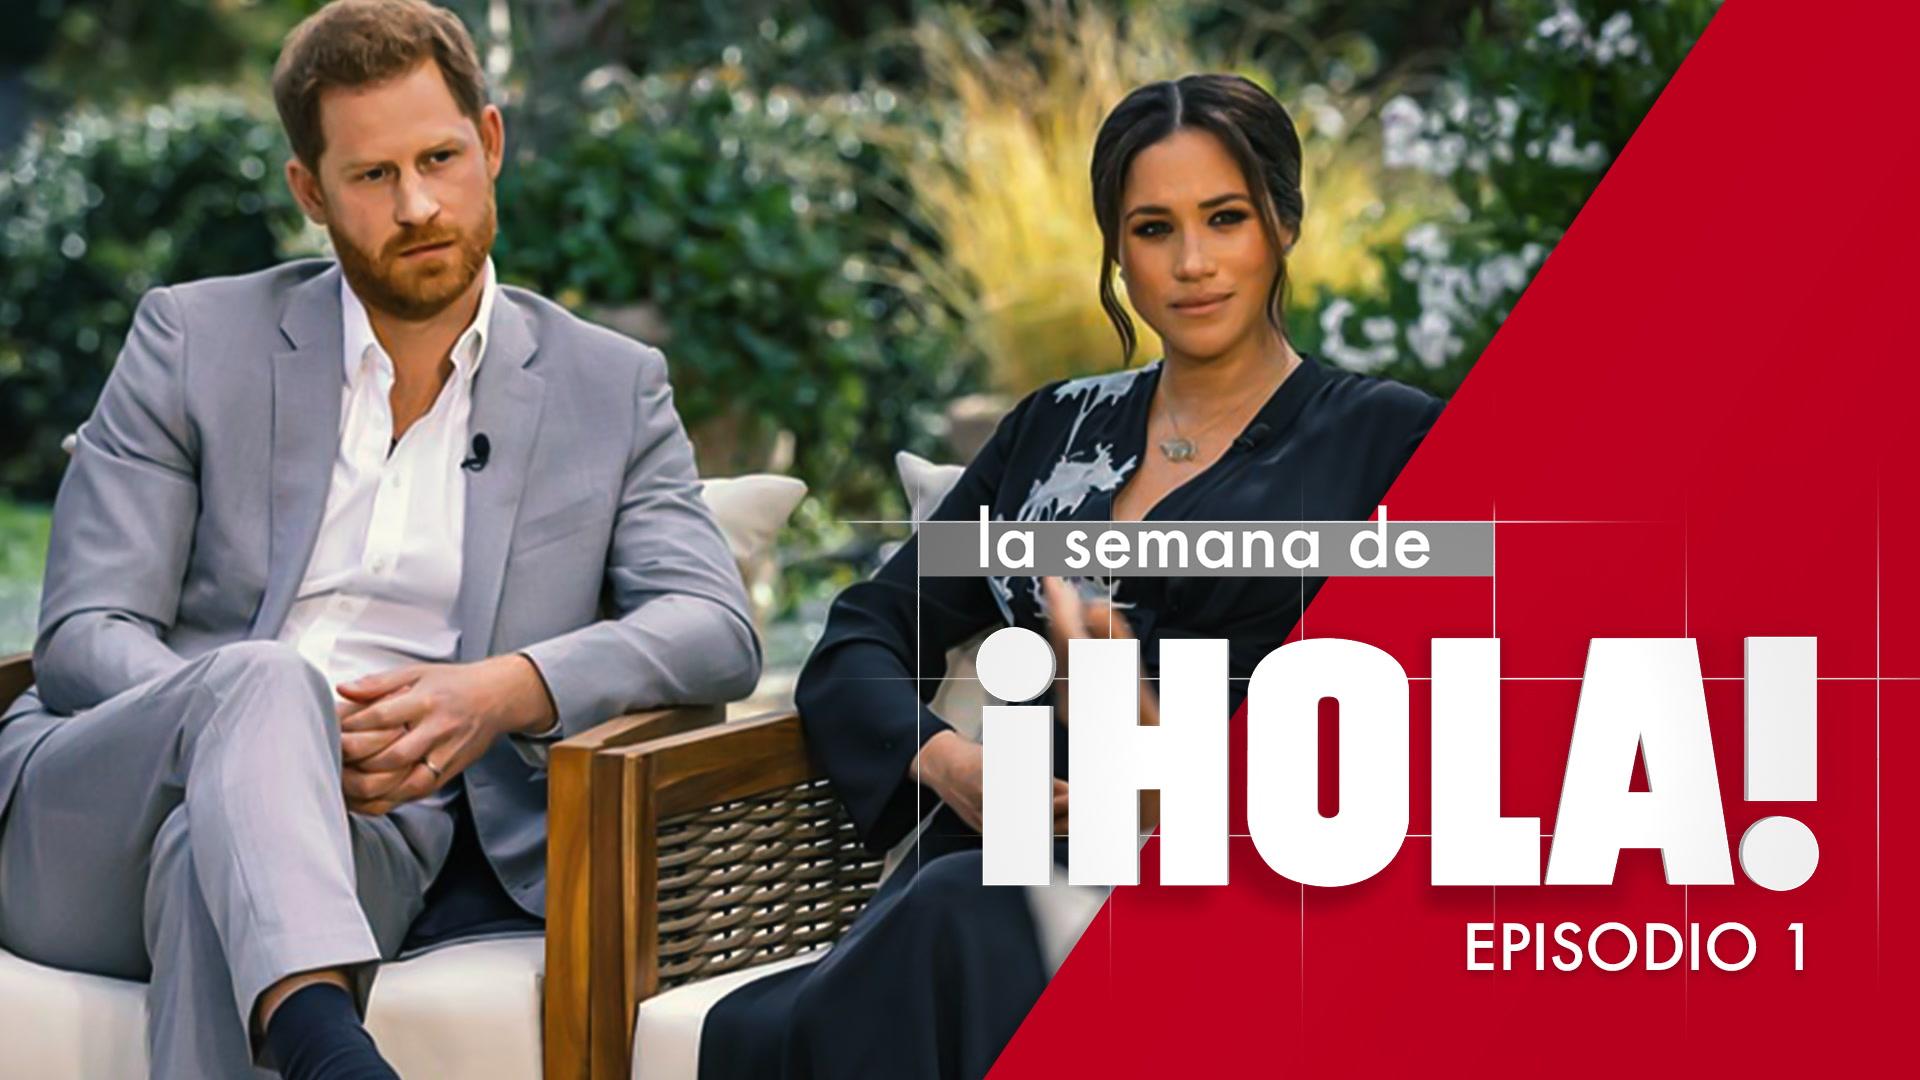 La semana de ¡HOLA! - Episodio 1